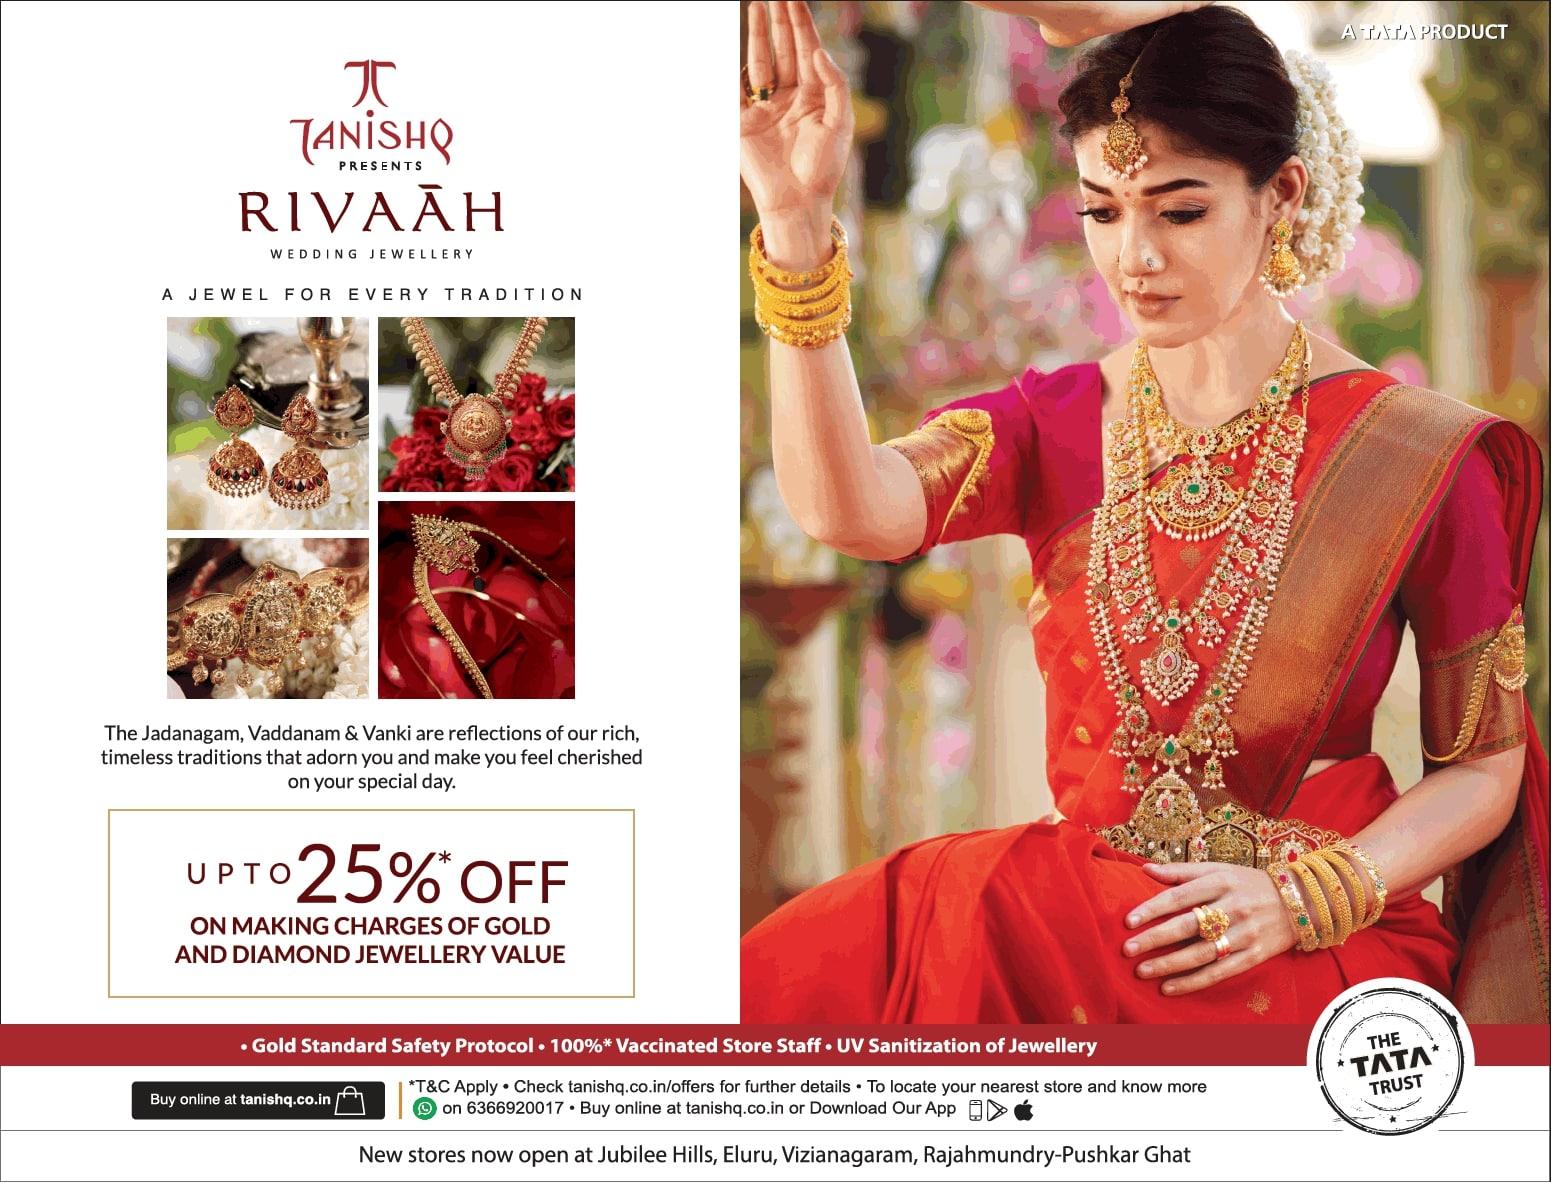 tanishq-rivaah-telugu-wedding-jewellery-the-jadanagam-vaddanam-and-vanki-ad-toi-hyderabad-1-7-2021